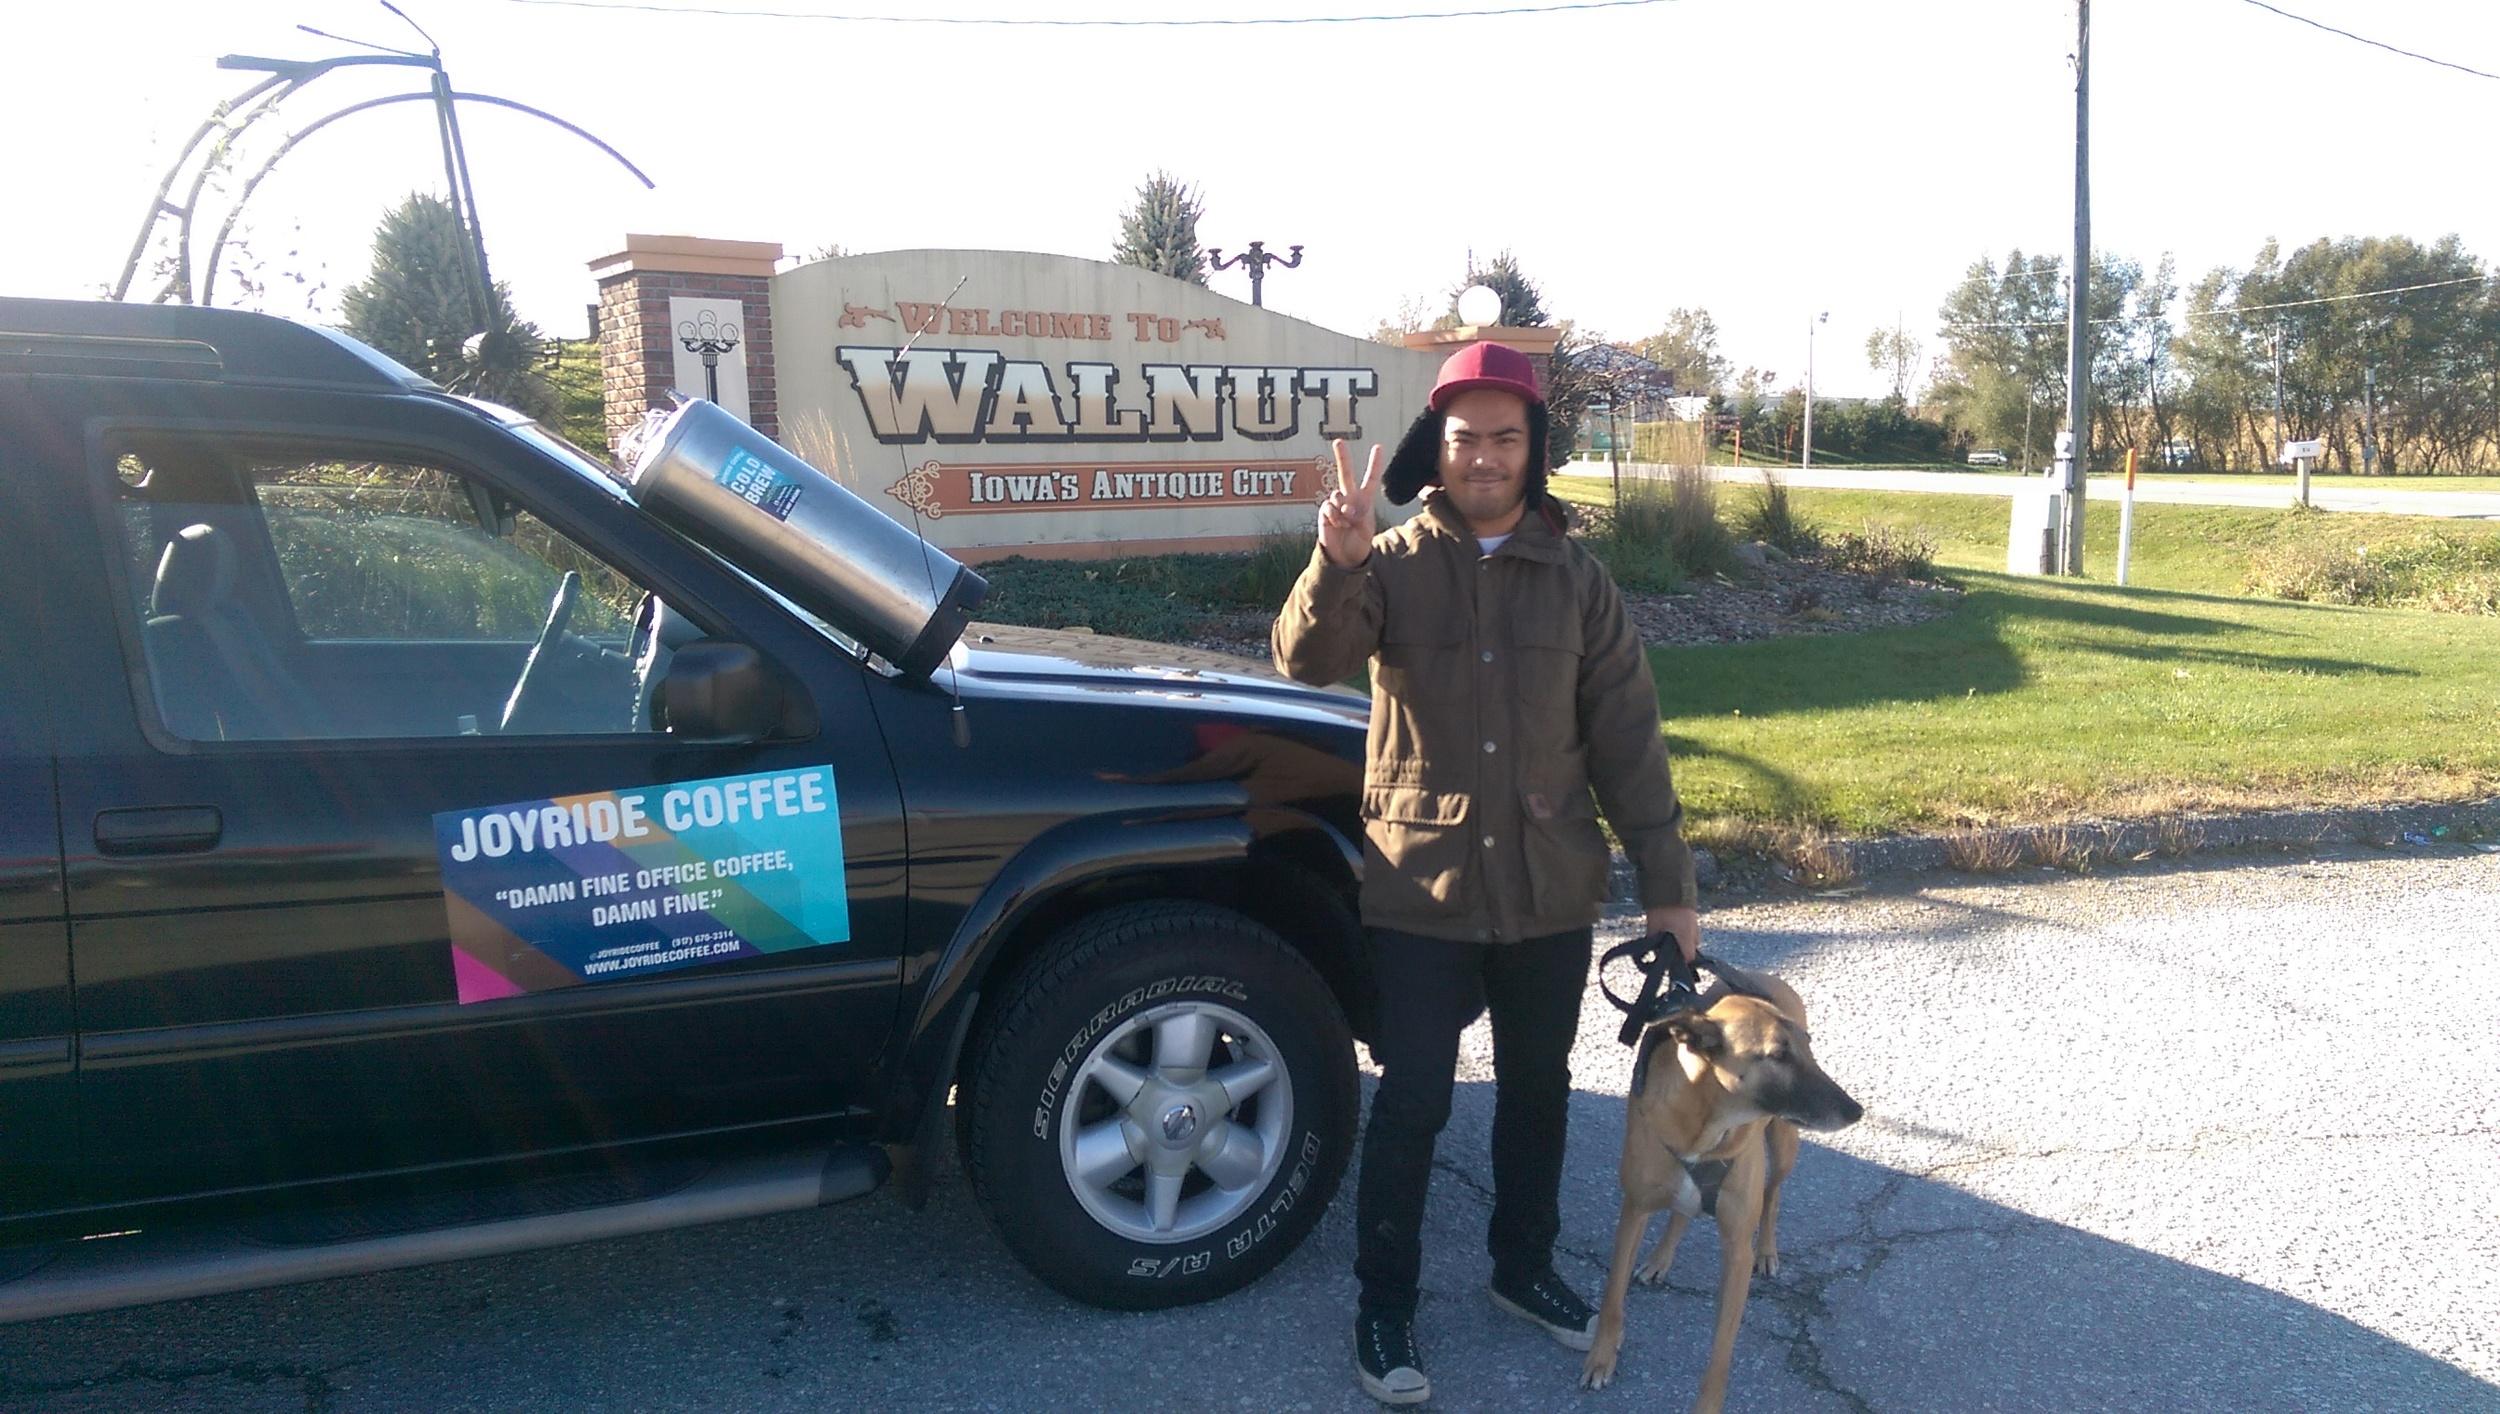 Marc & Eli hangin' in Walnut. (Marc has a new hat each day.)